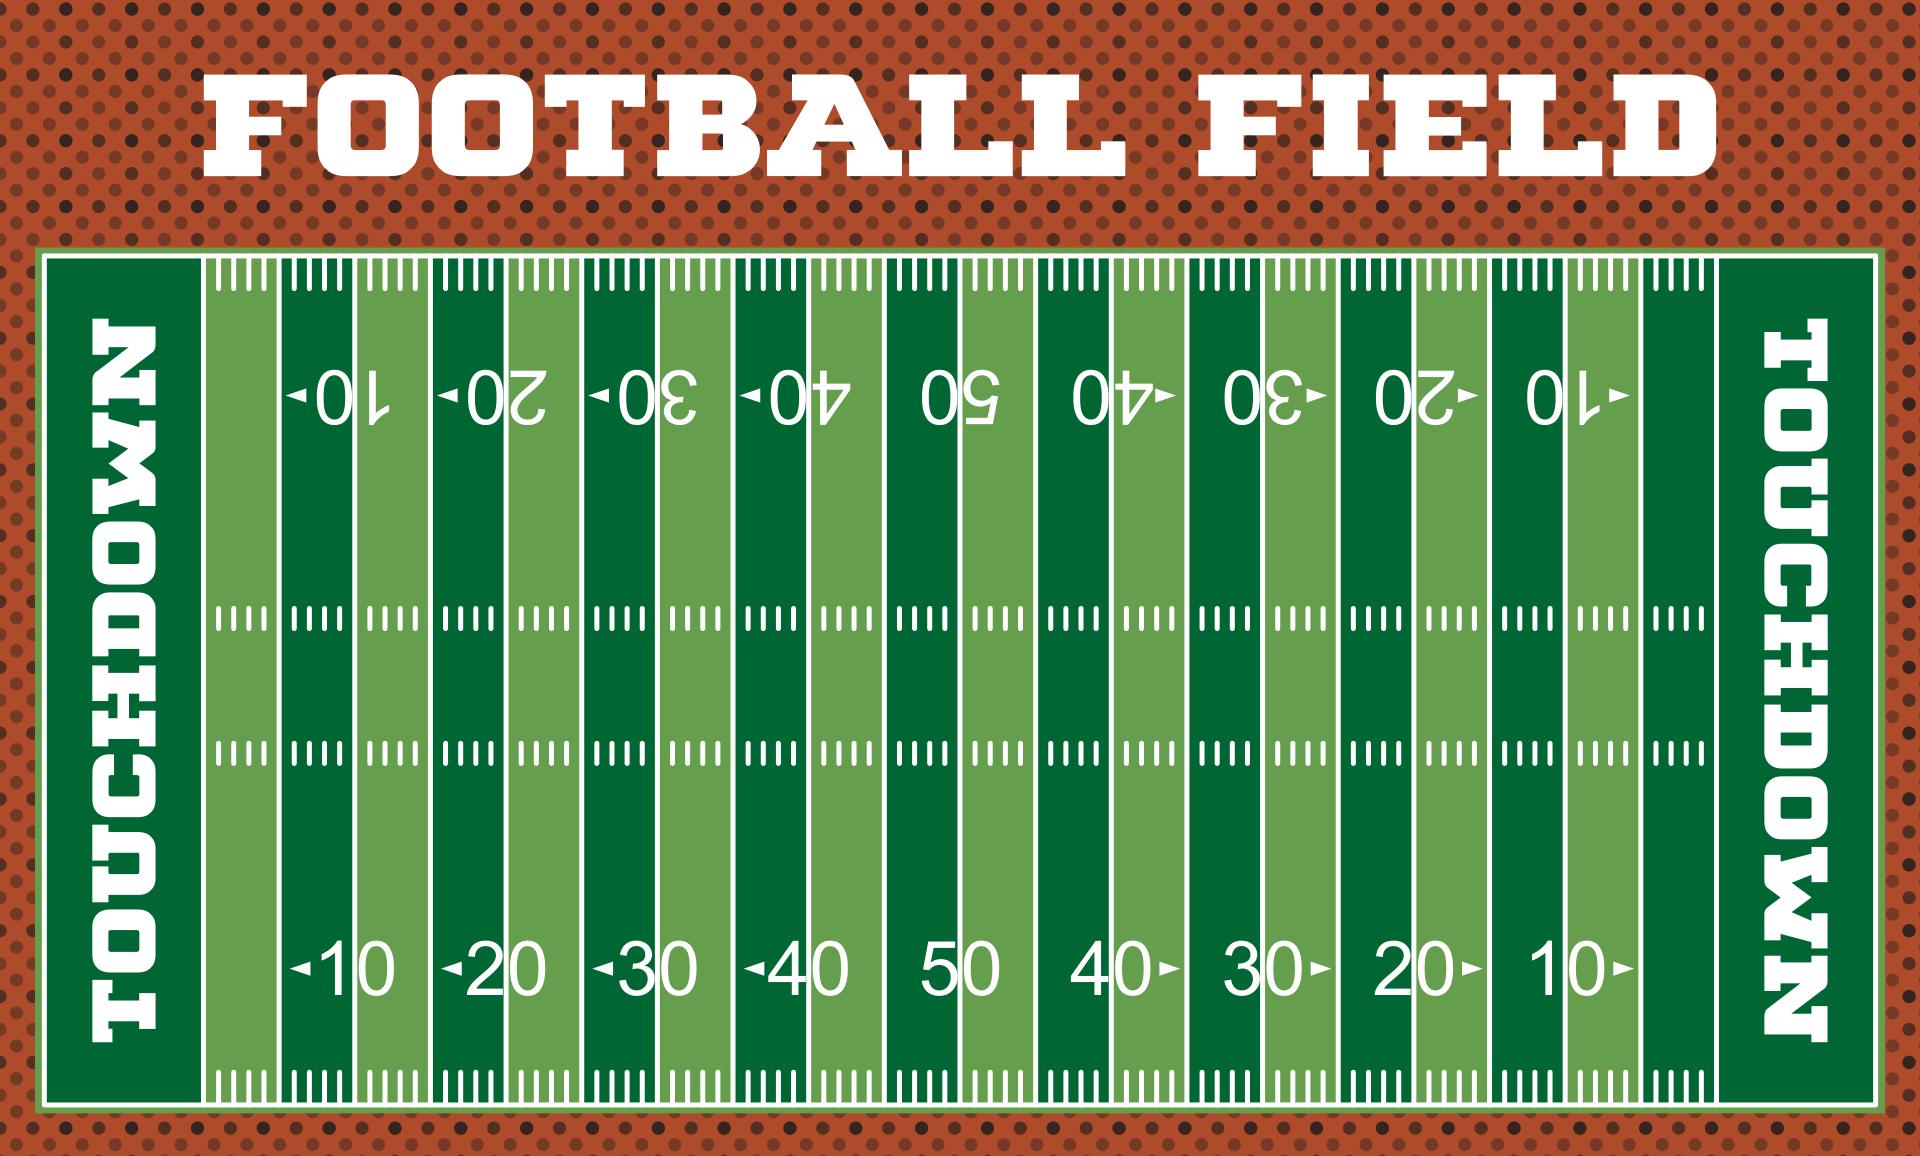 Football Field Diagram Template